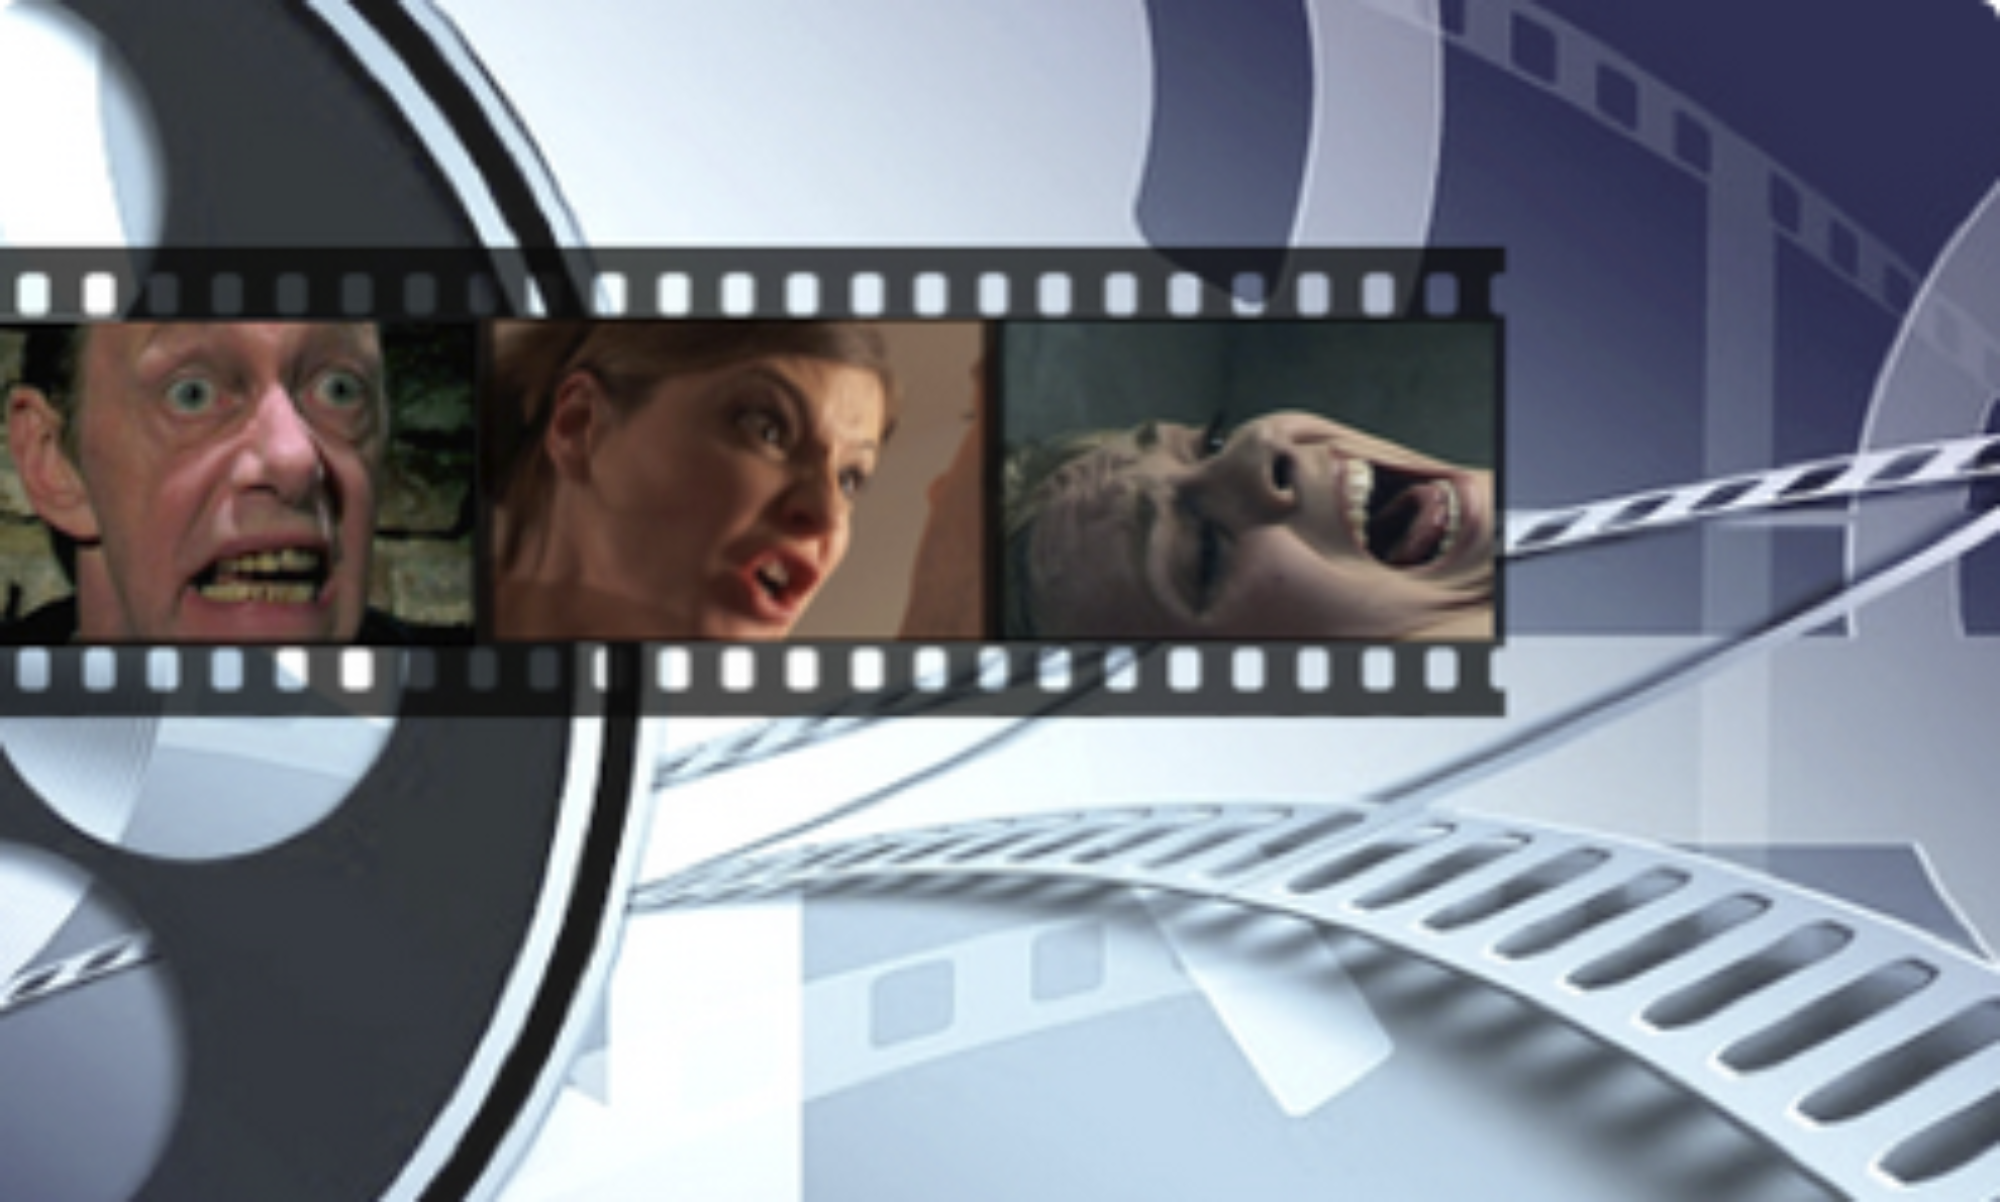 Moviecash